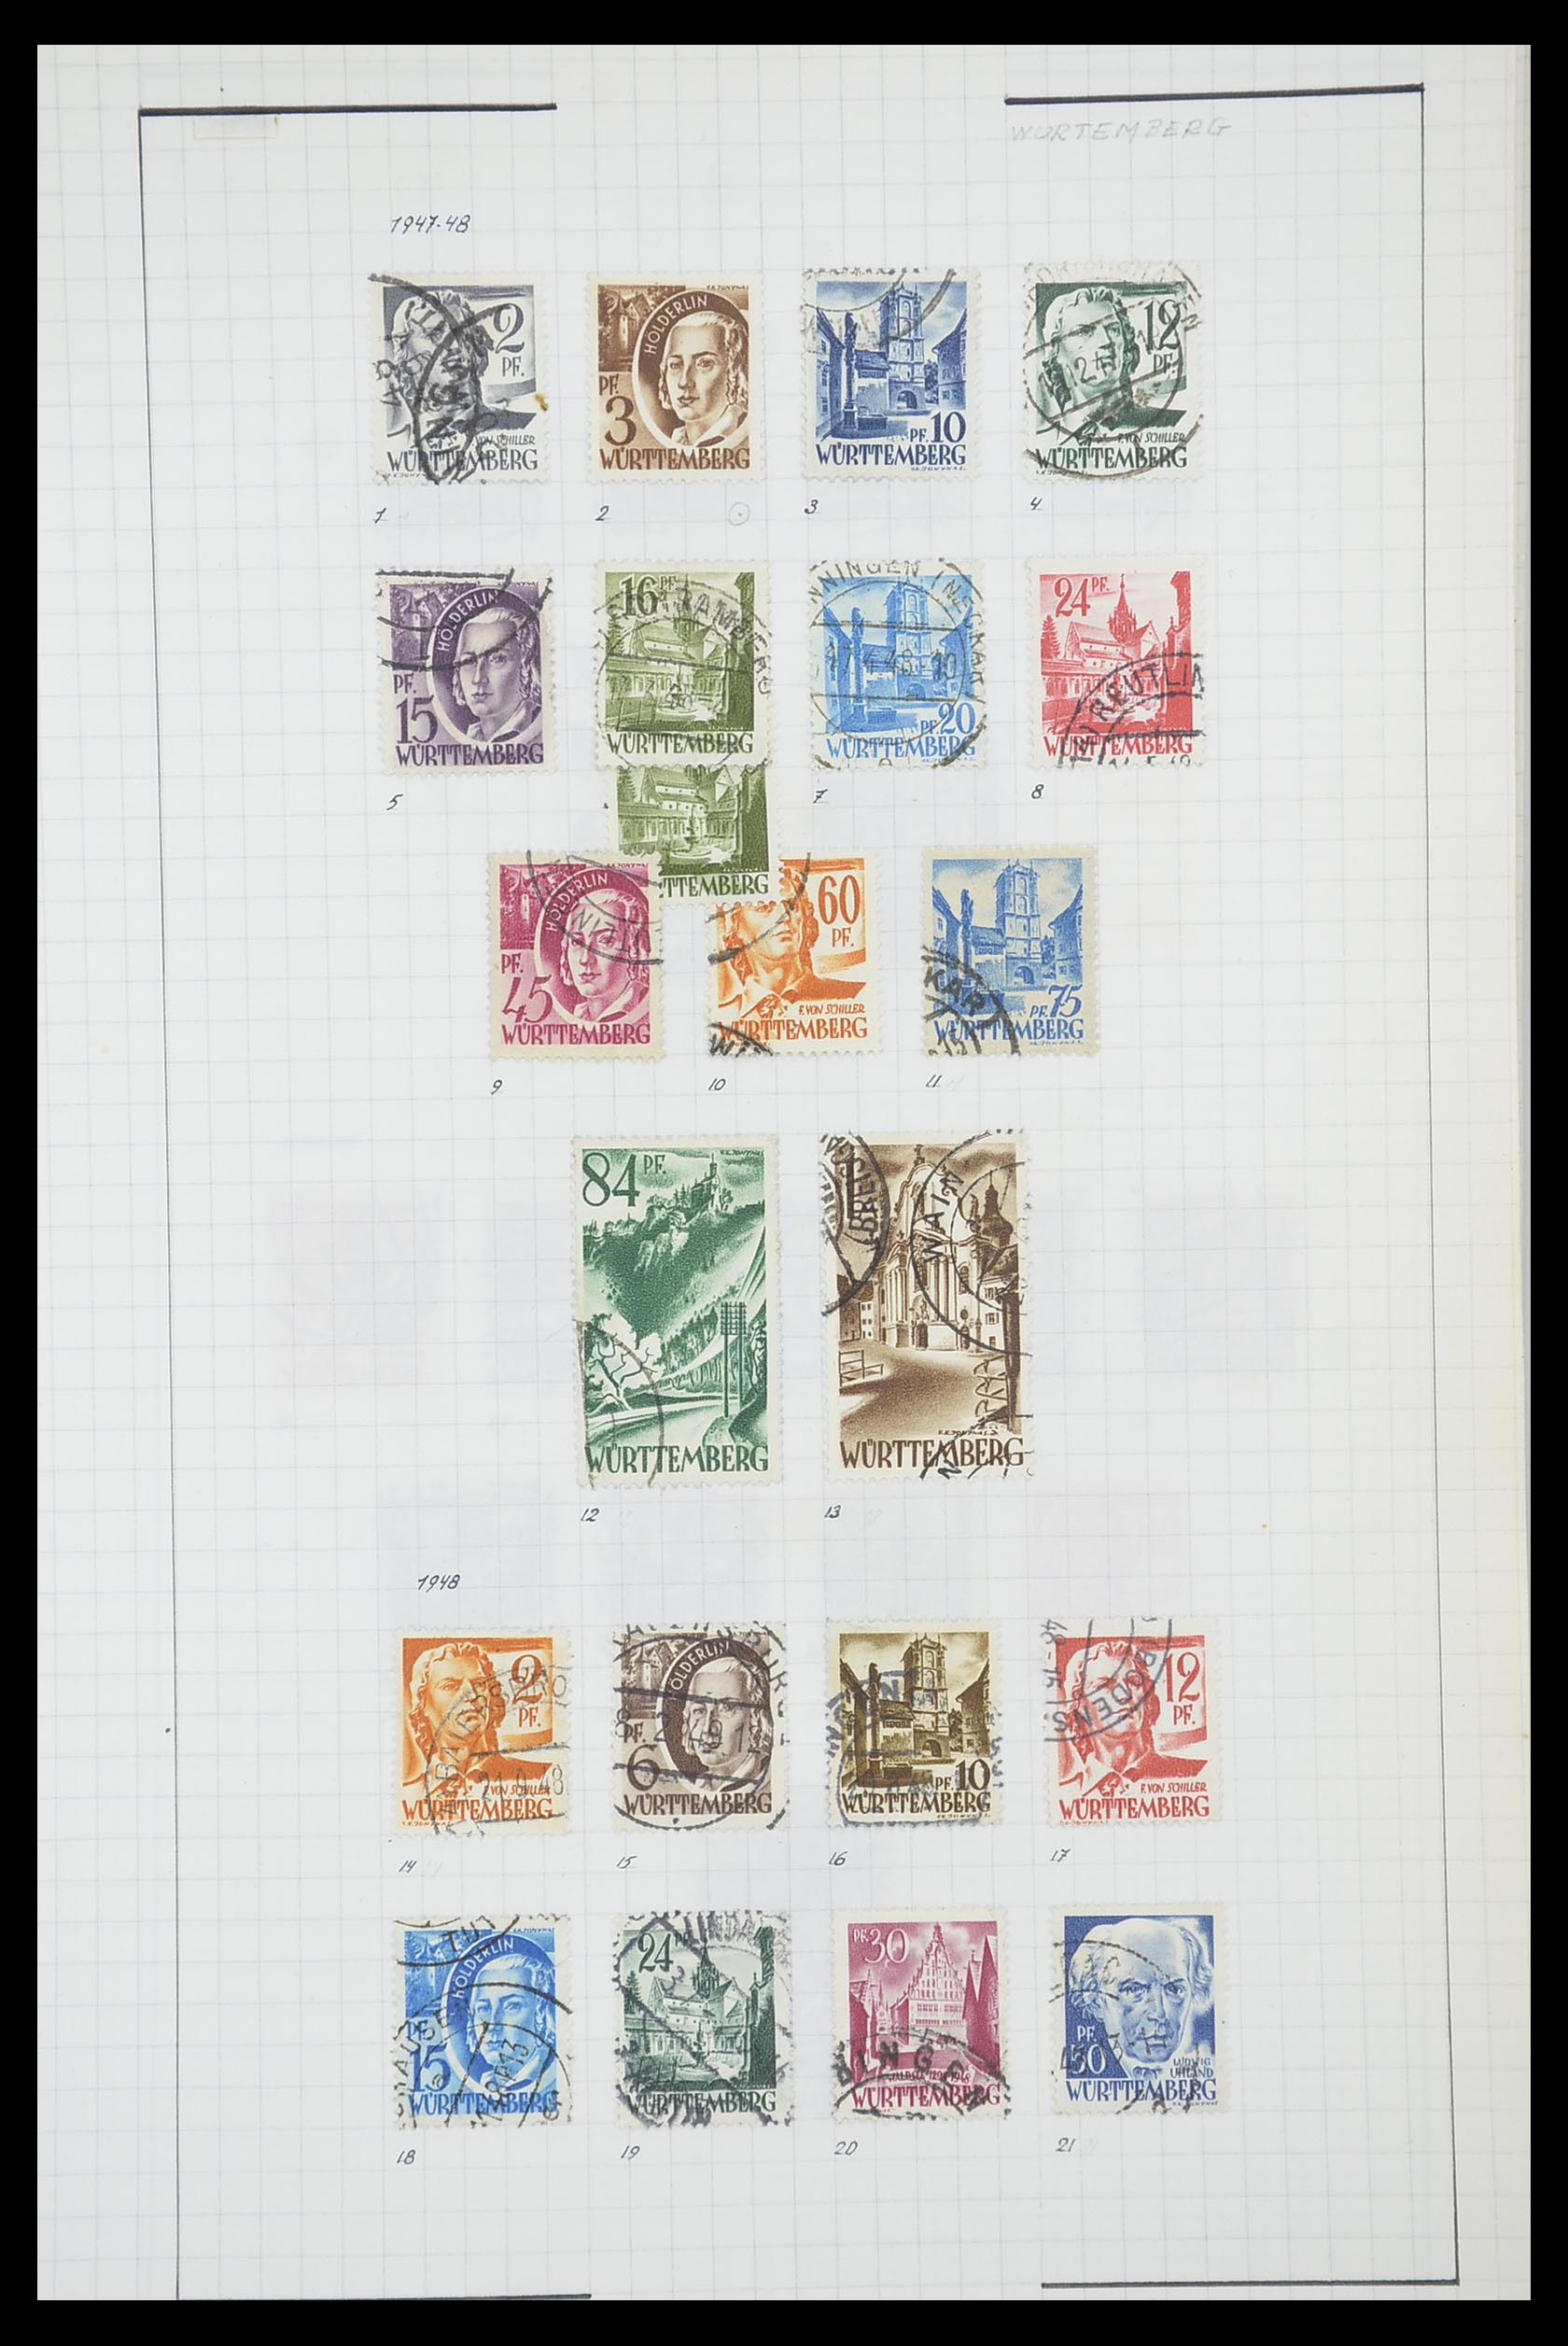 33864 020 - Postzegelverzameling 33864 Franse Zone 1945-1949.